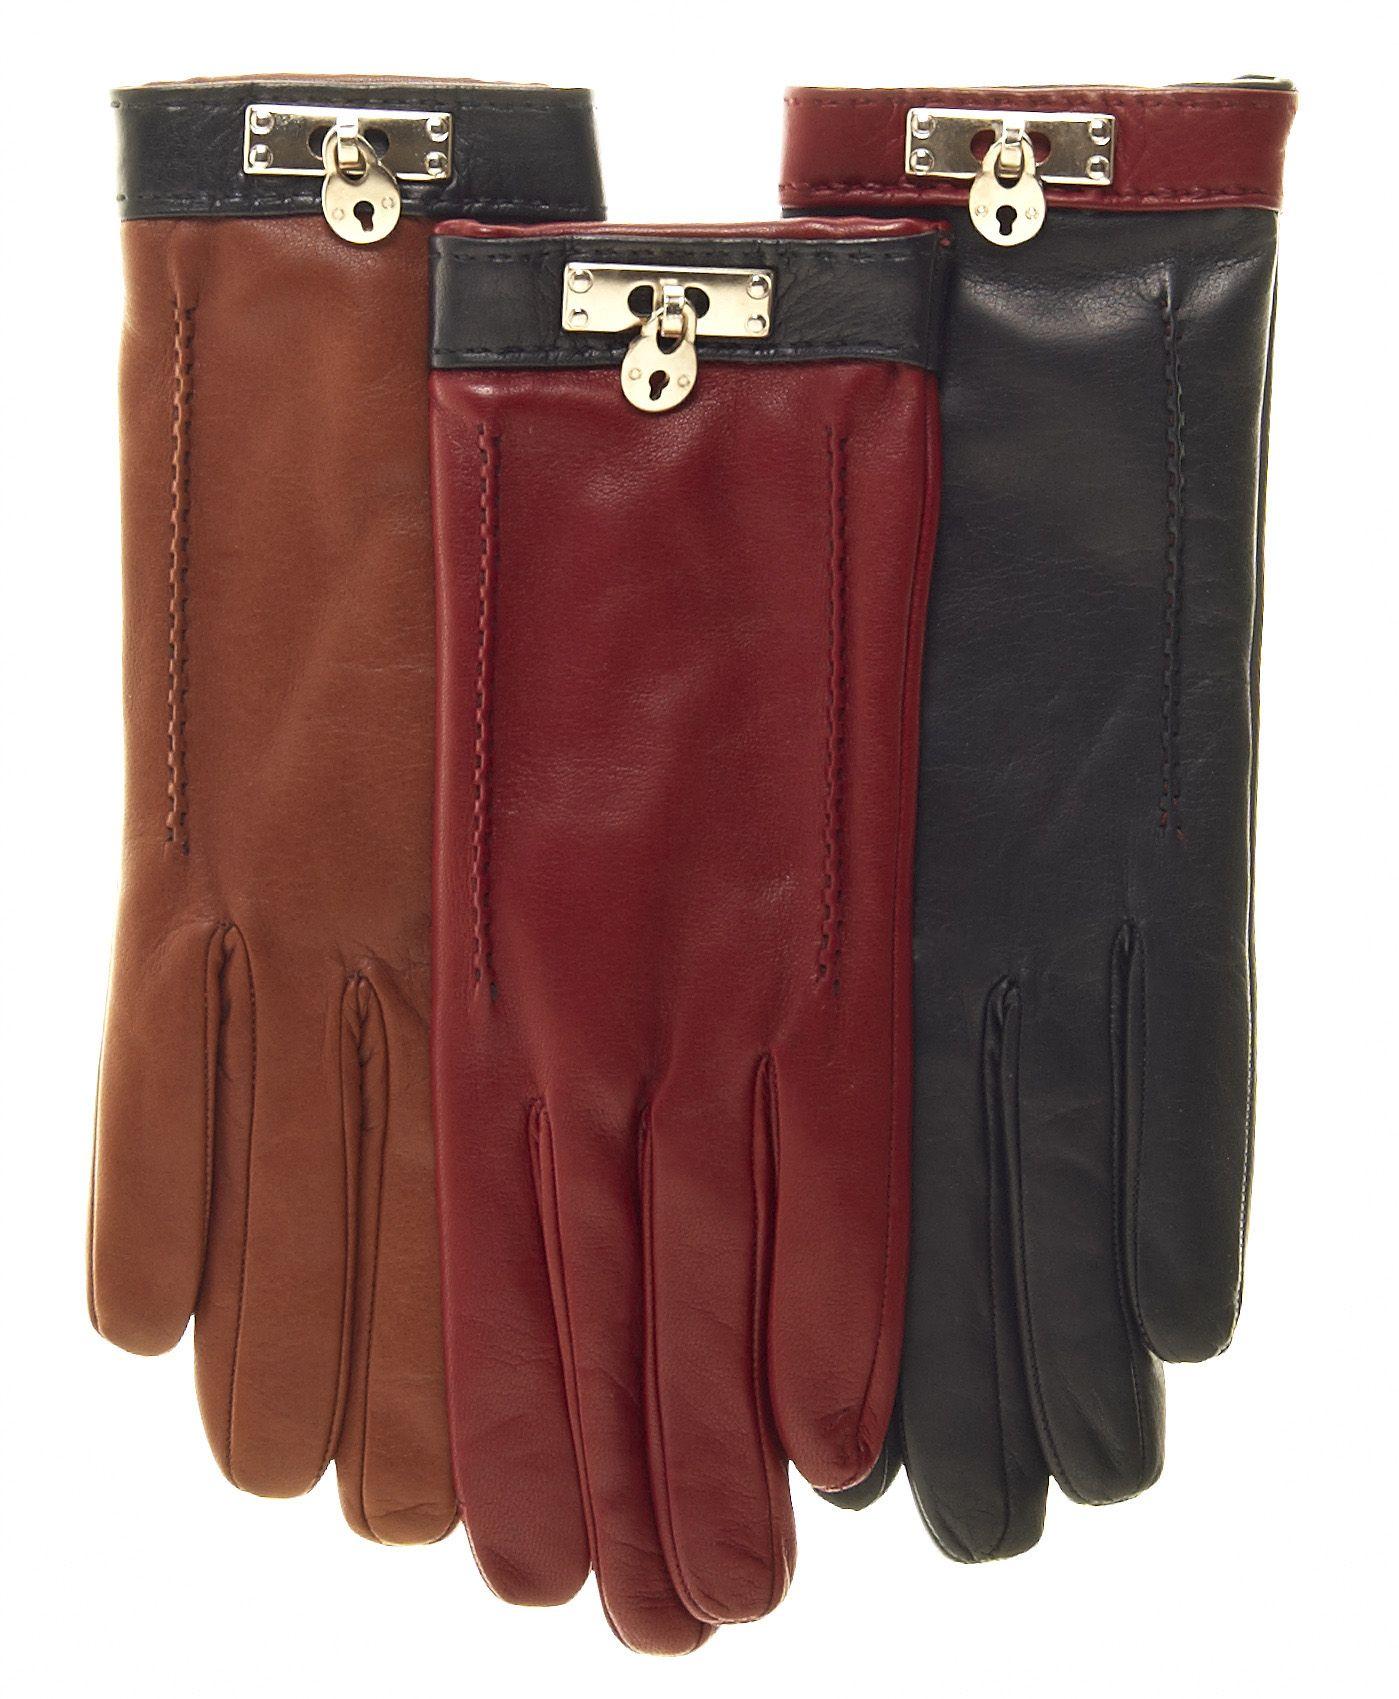 Womens lined leather gloves - Women S Italian Cashmere Lined Leather Gloves With Brass Lock Charm